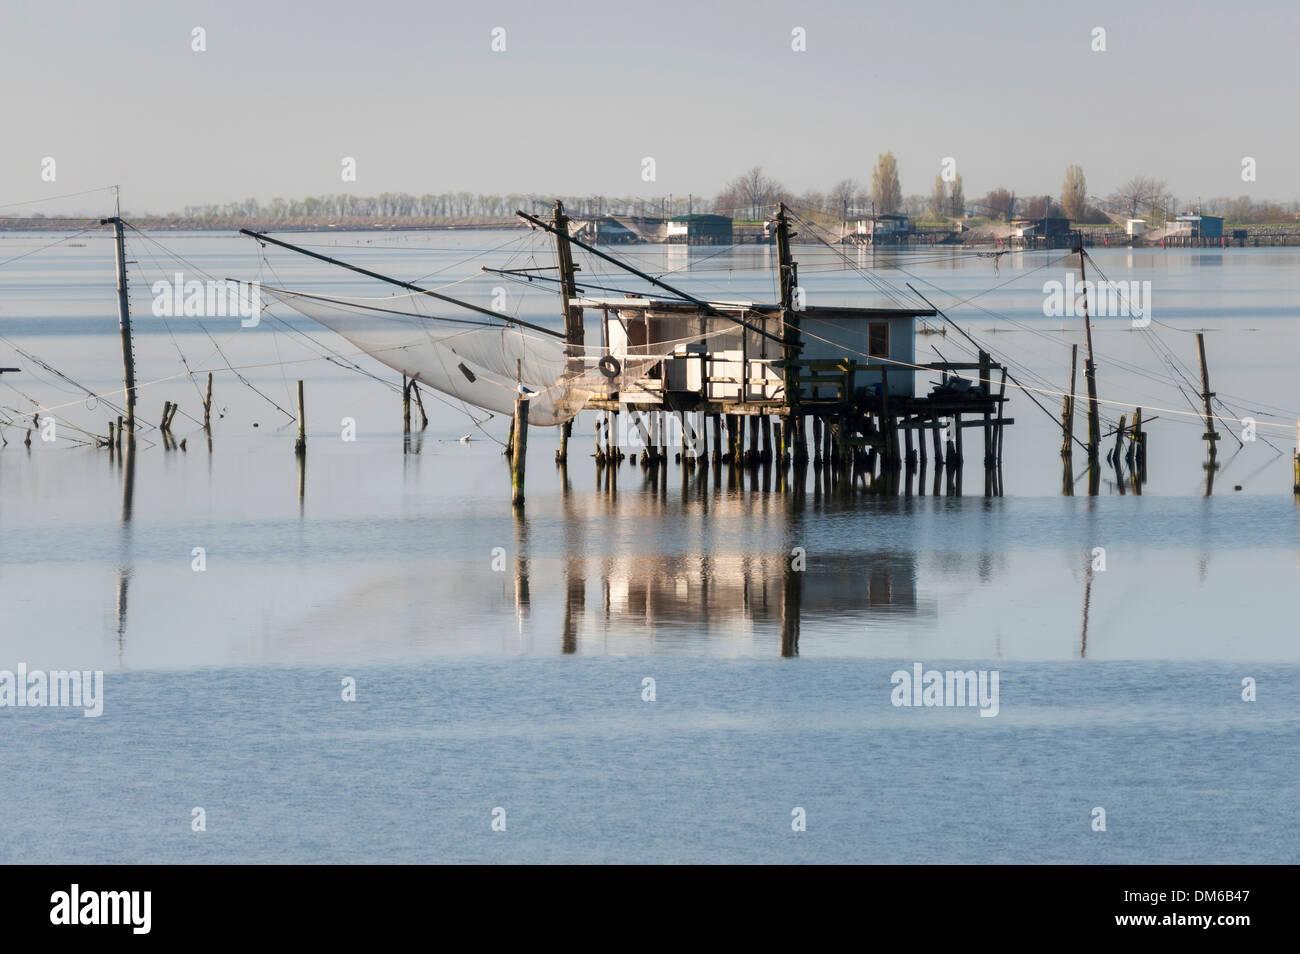 Fishing hut in a lagoon, with reflections, Po River Delta, Comacchio, Emilia-Romagna, Italy - Stock Image